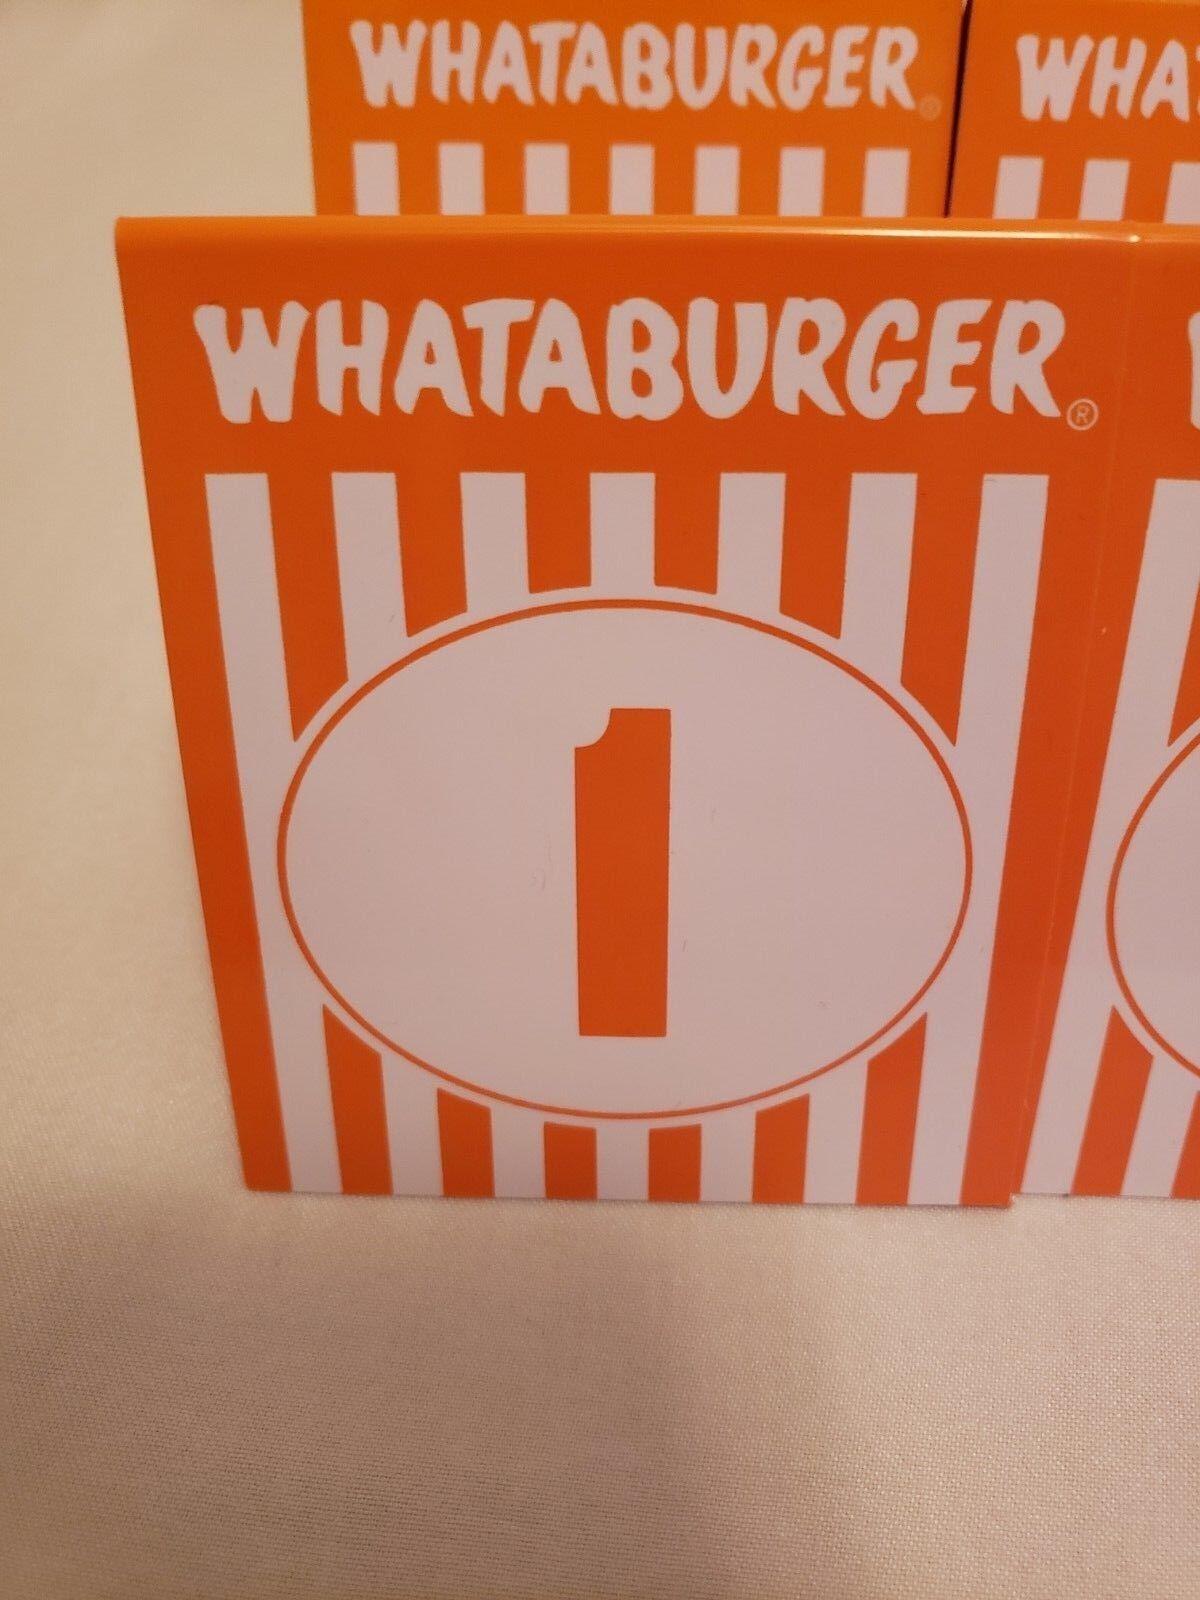 1  Sheet NEW Whataburger Vinyl Decals Promotional Item